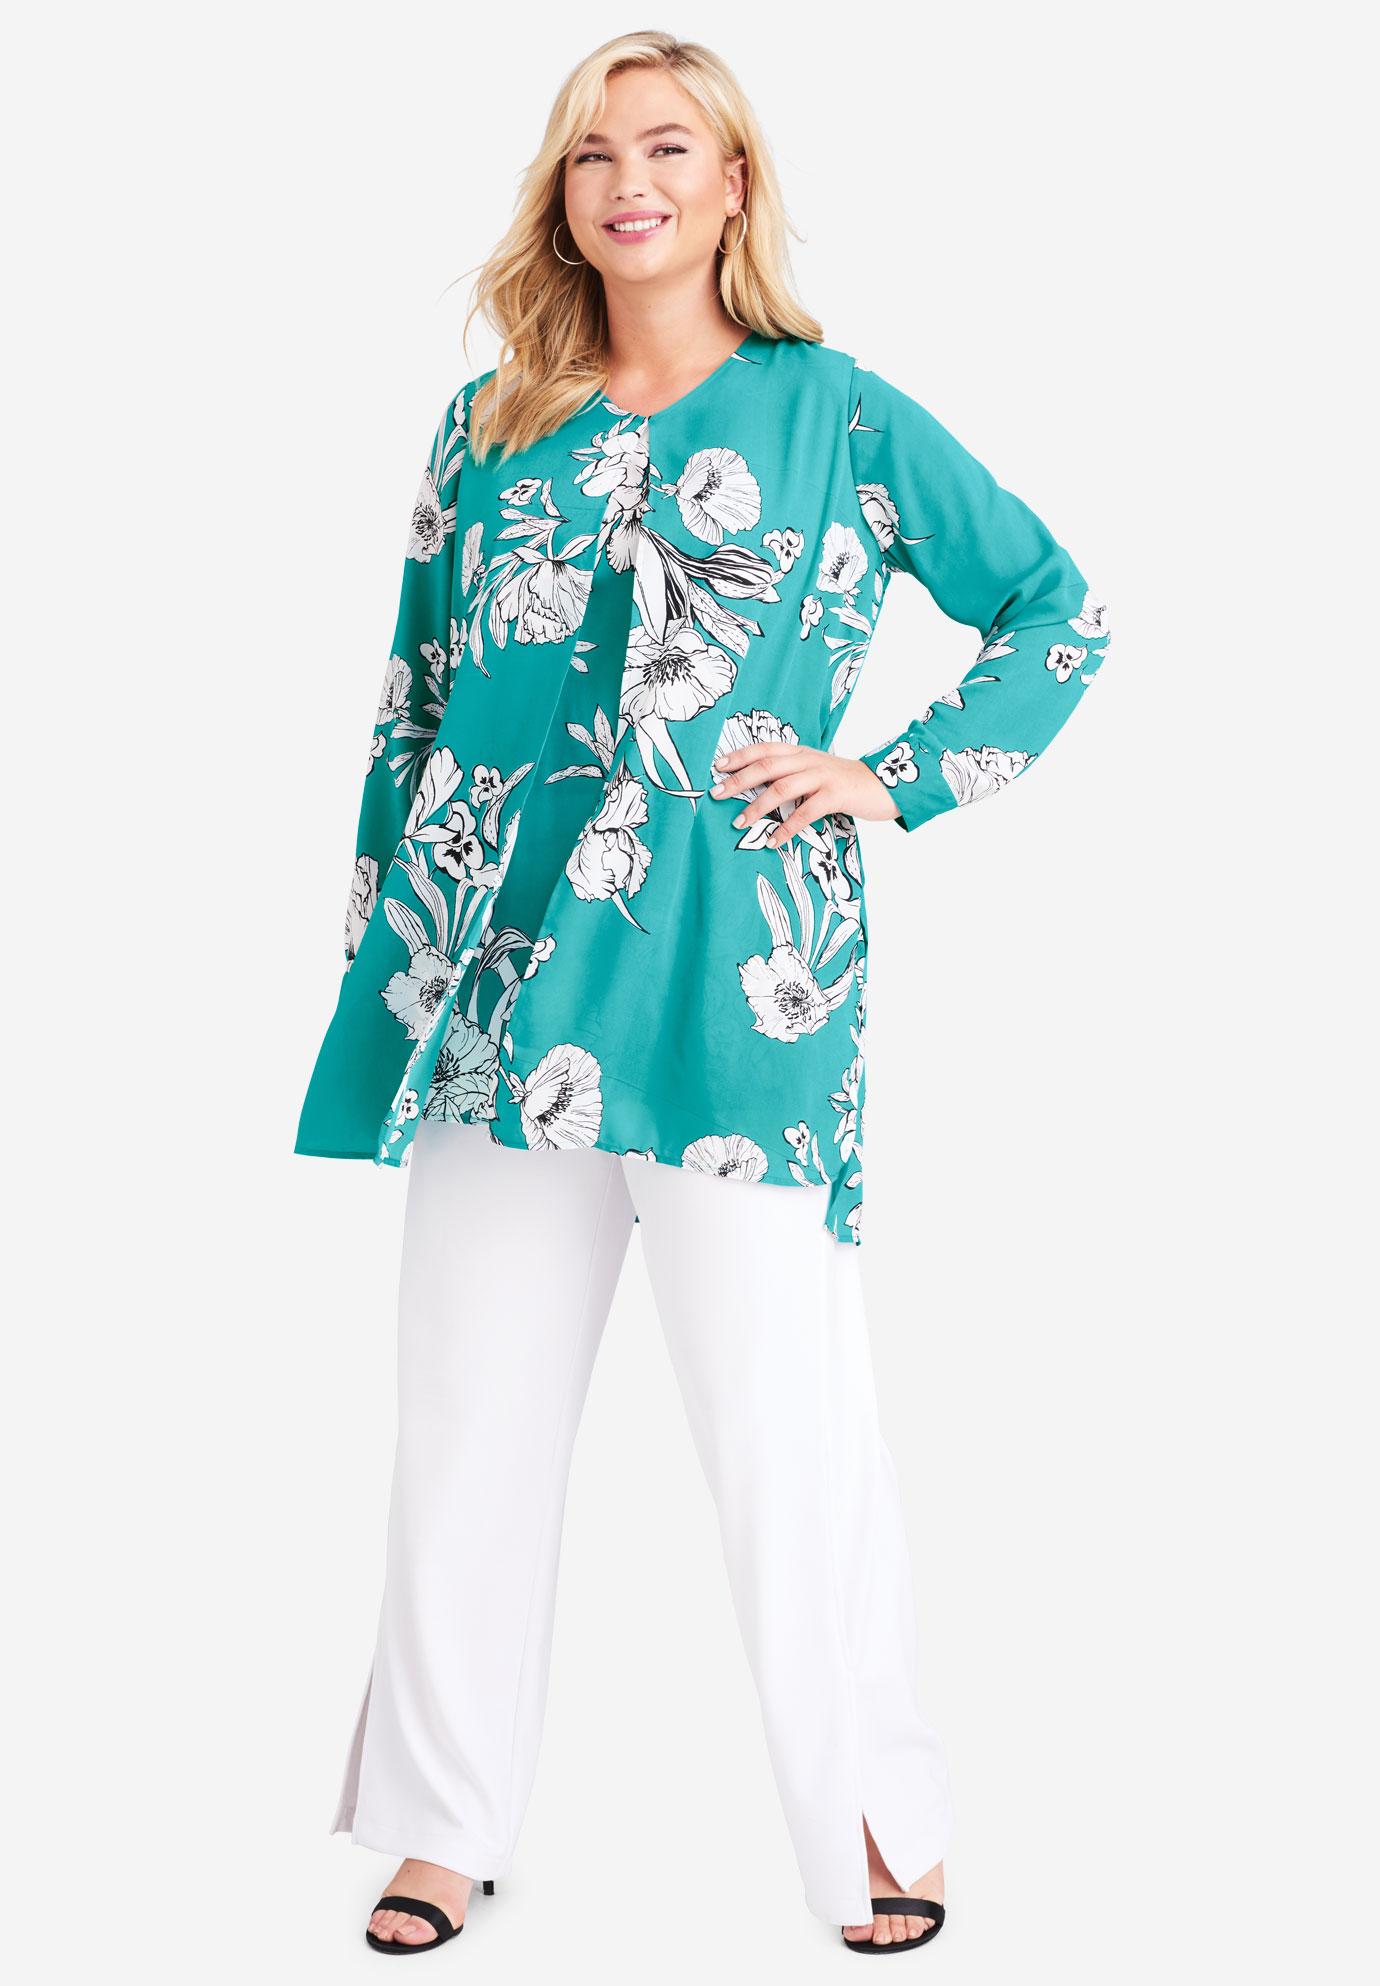 7a413cde1a0 Flyaway V-Neck Tunic  Plus Size Tunics   Jessica London